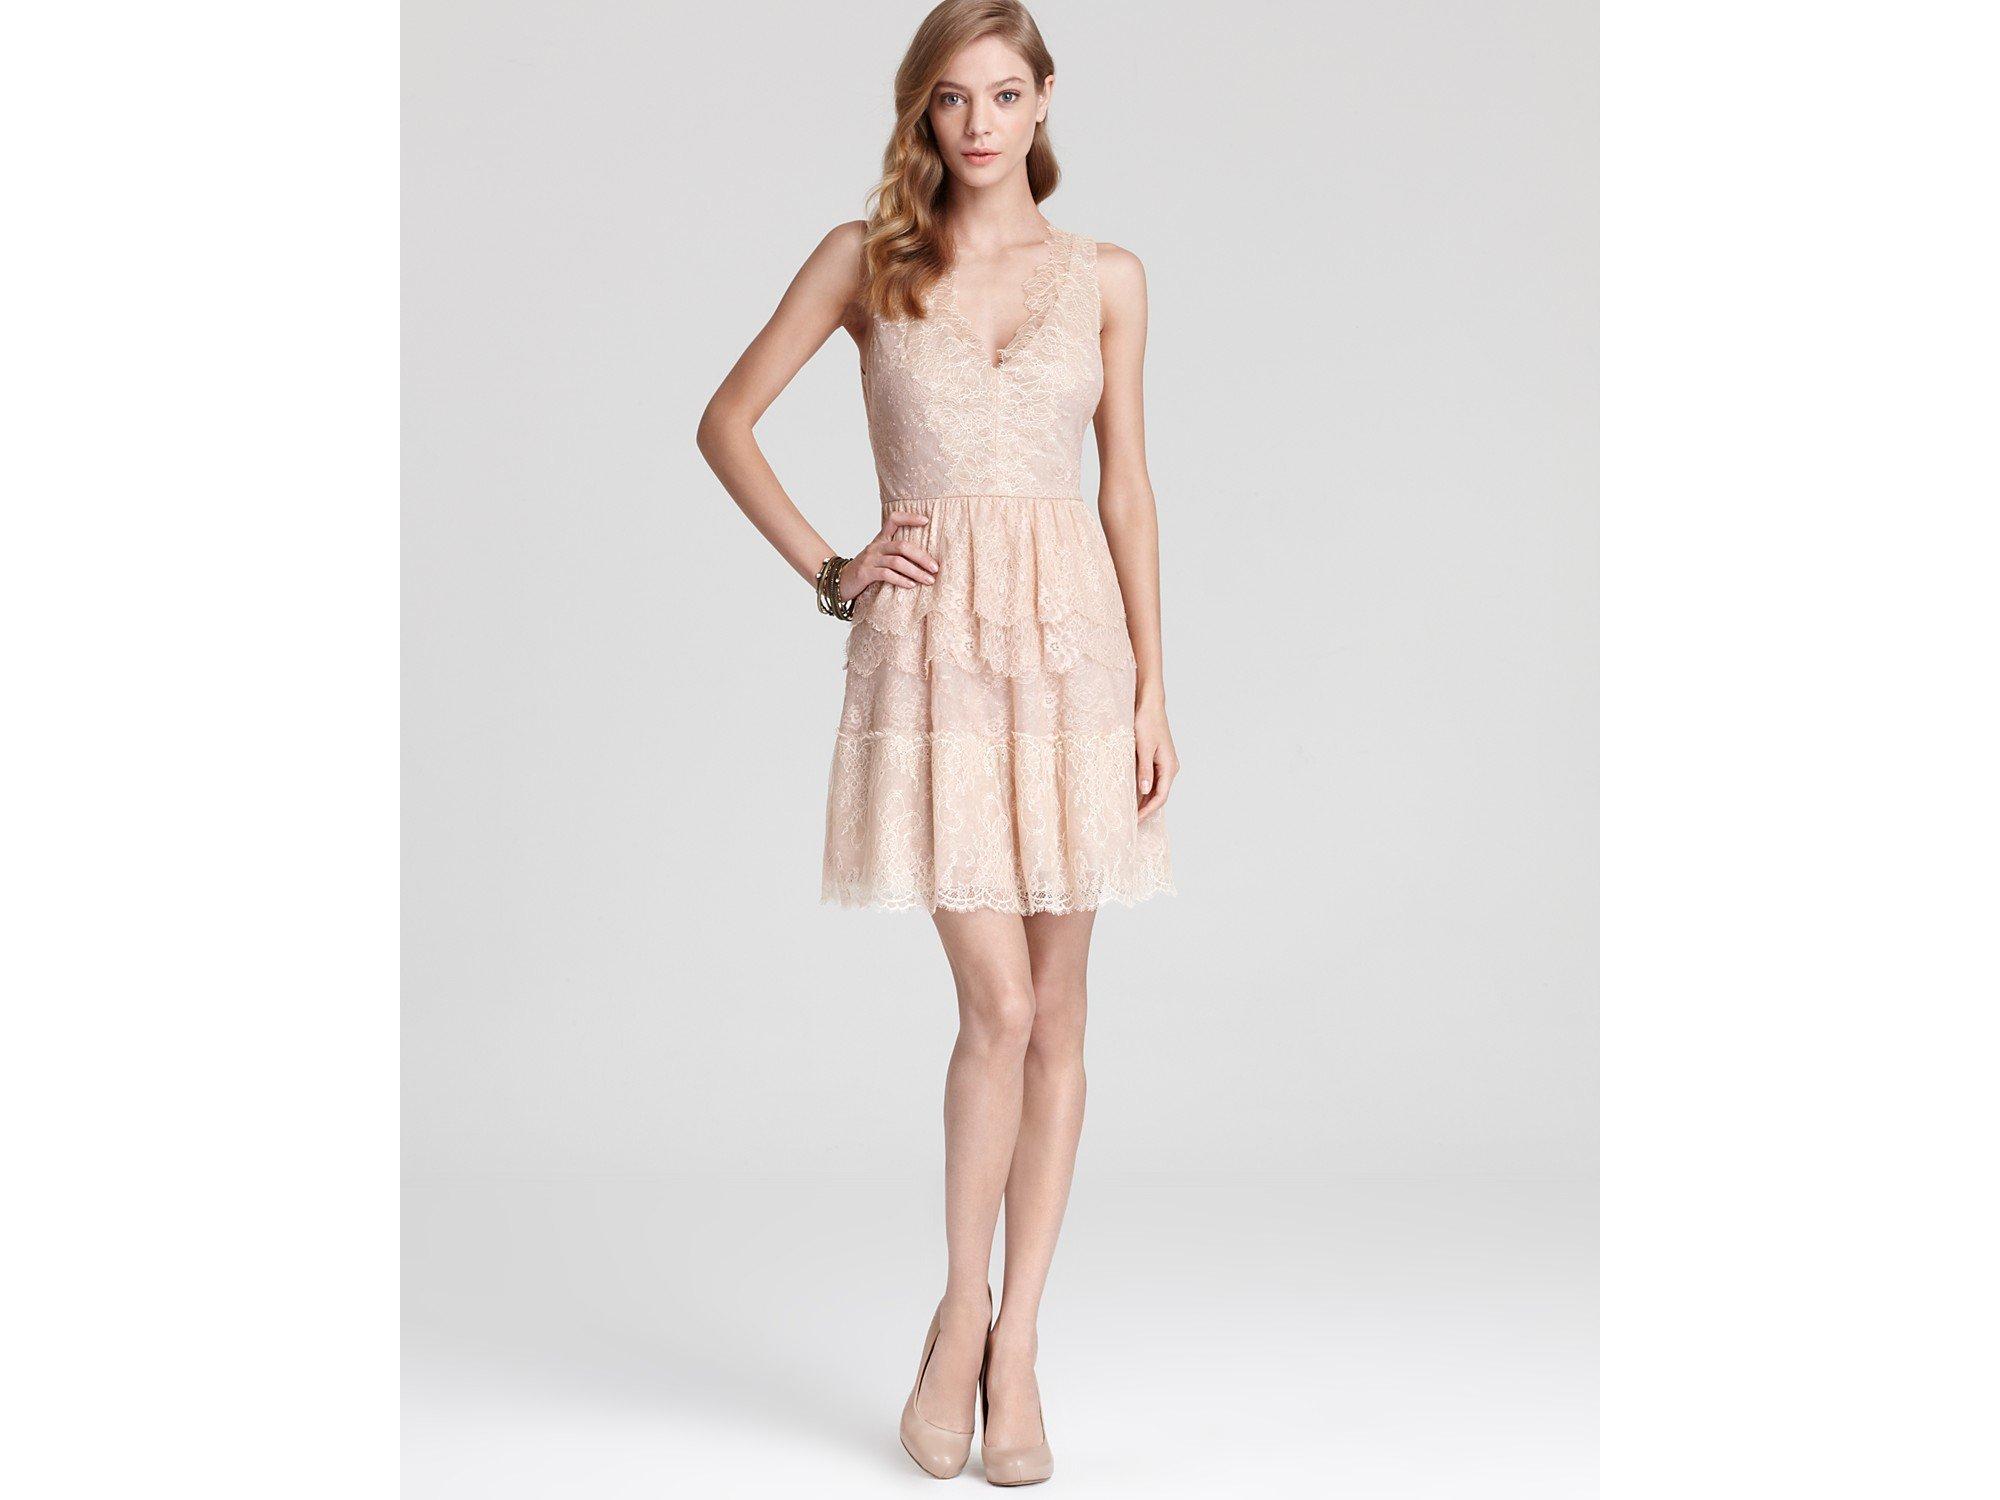 Bloomingdales blush colored bridesmaids dresses bridesmaid bloomingdales blush colored bridesmaids dresses ombrellifo Images